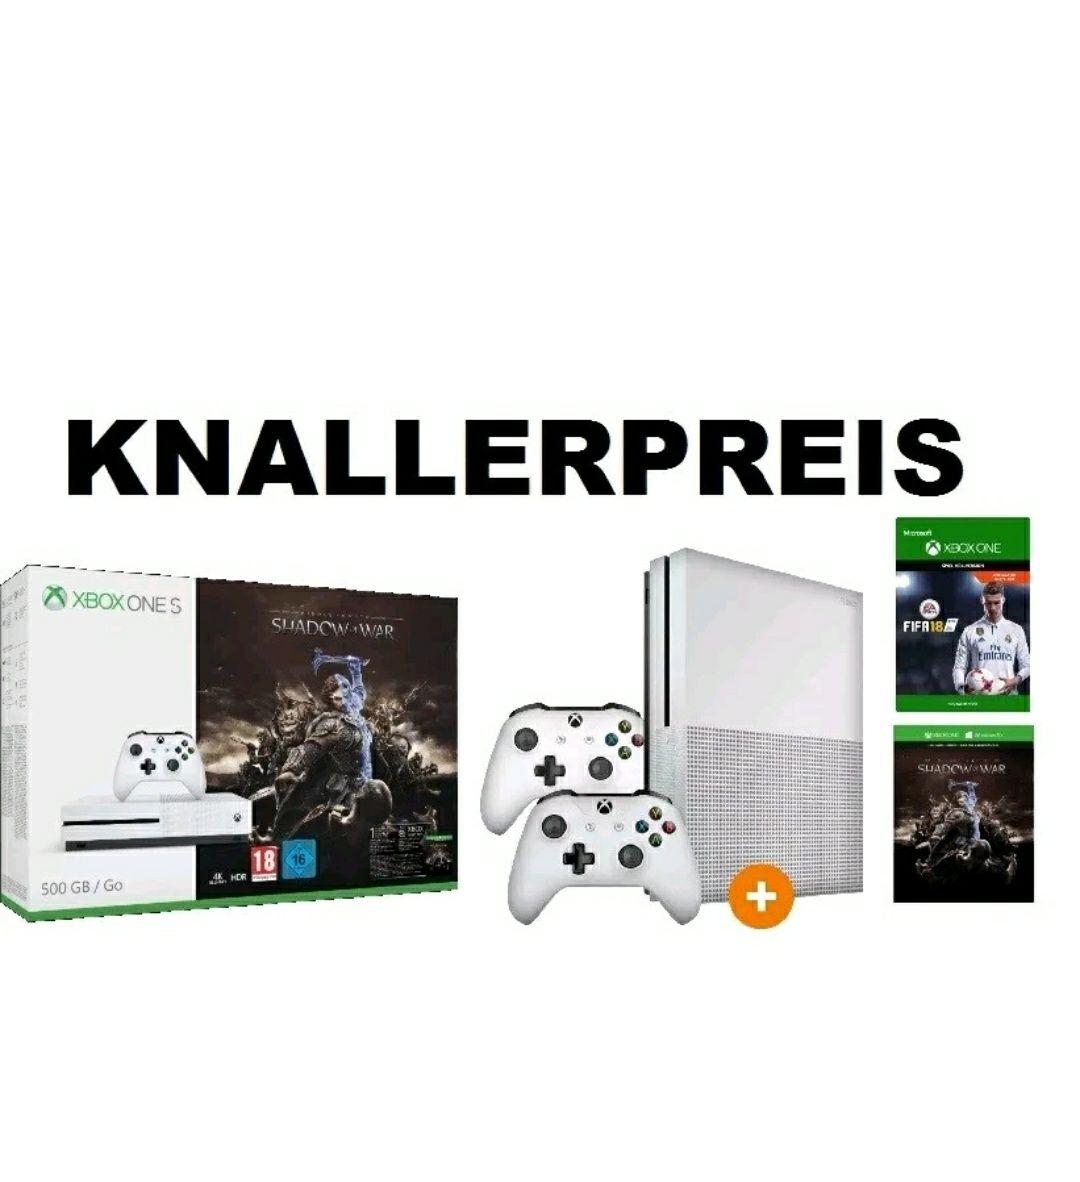 XBOX ONE S + 2 Controller + FIFA 18 + Mittelerde: Schatten des Krieges